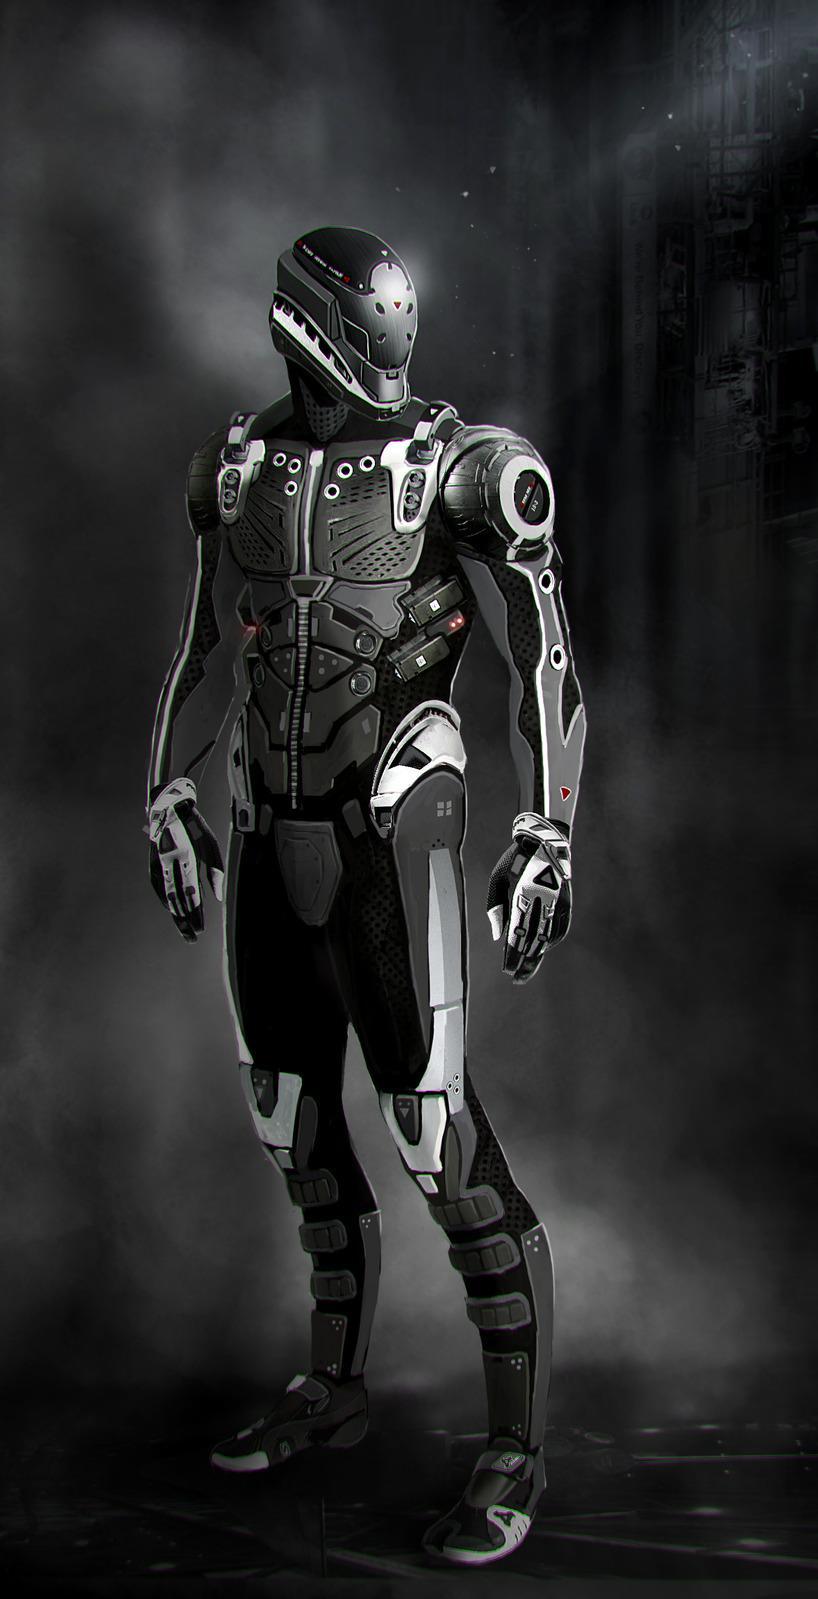 Suit concept by Bro-Bot - Eric Felten - CGHUB